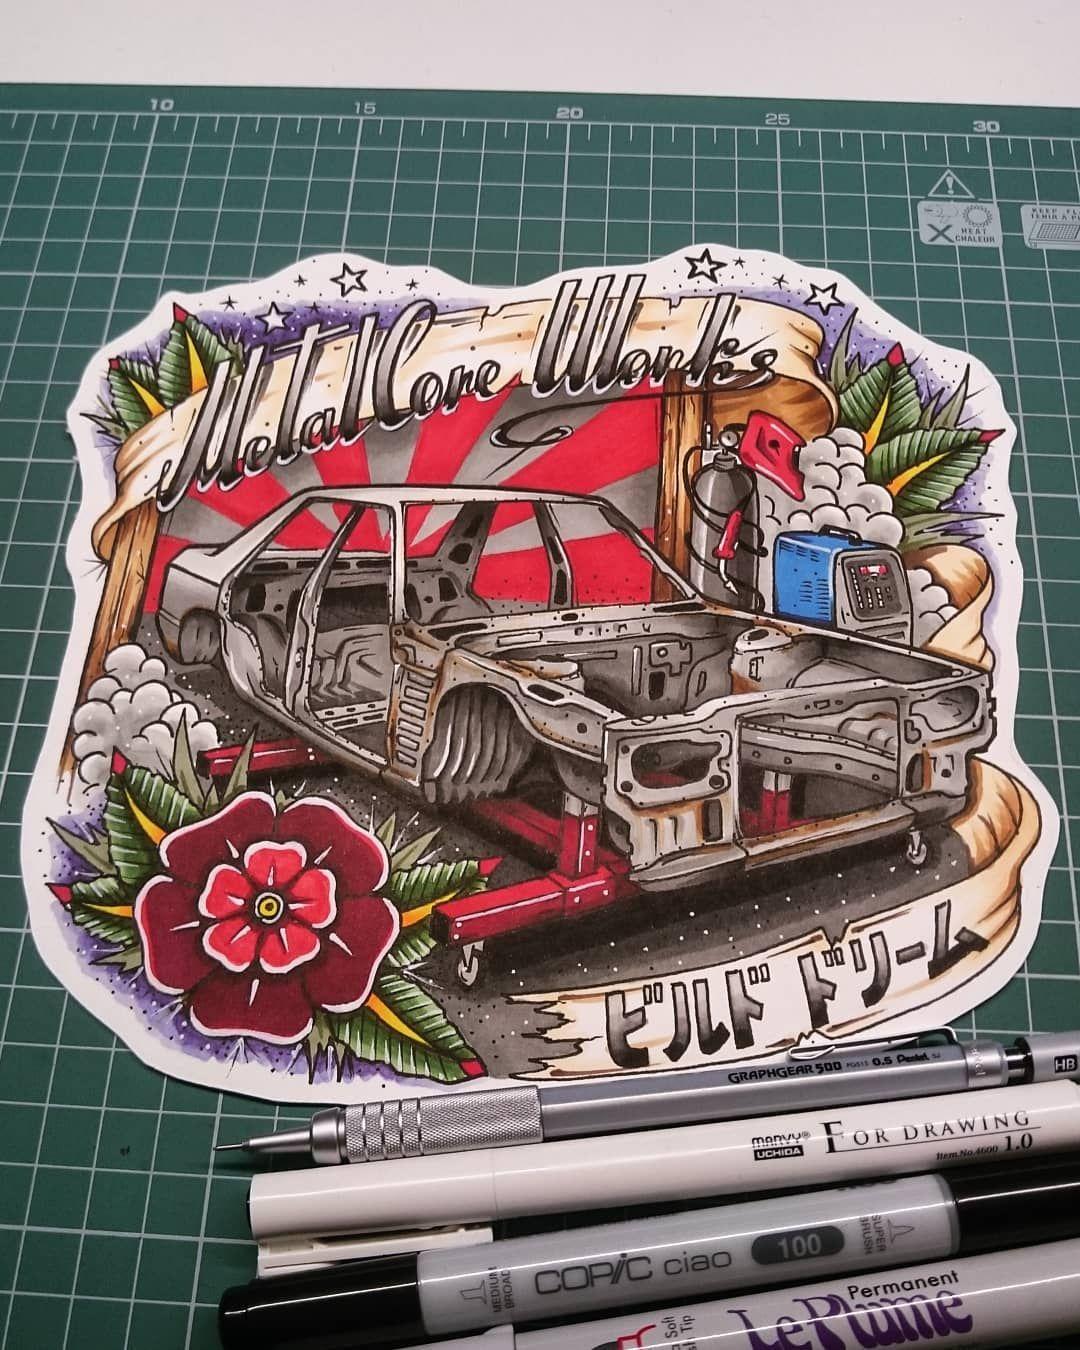 One of my fav works..❤ #METALCOREWORKS  #メタルコアワークス  #スカイライン #SkylineR30 #R30 #CarDrawing #ドローイング  #РисунокАвто #РисунокМашины  #TattooSketch #TattooFlash #タトゥー #ТатуЭскиз  #CarTattoo#ТатуАвто #TraditionalTattoo  #JapaneseTattoo #Irezumi #Illustration #イラスト  #CarIllustration #カーイラスト #車の絵 #CarArt #DrawToDrive #Copic #コピック